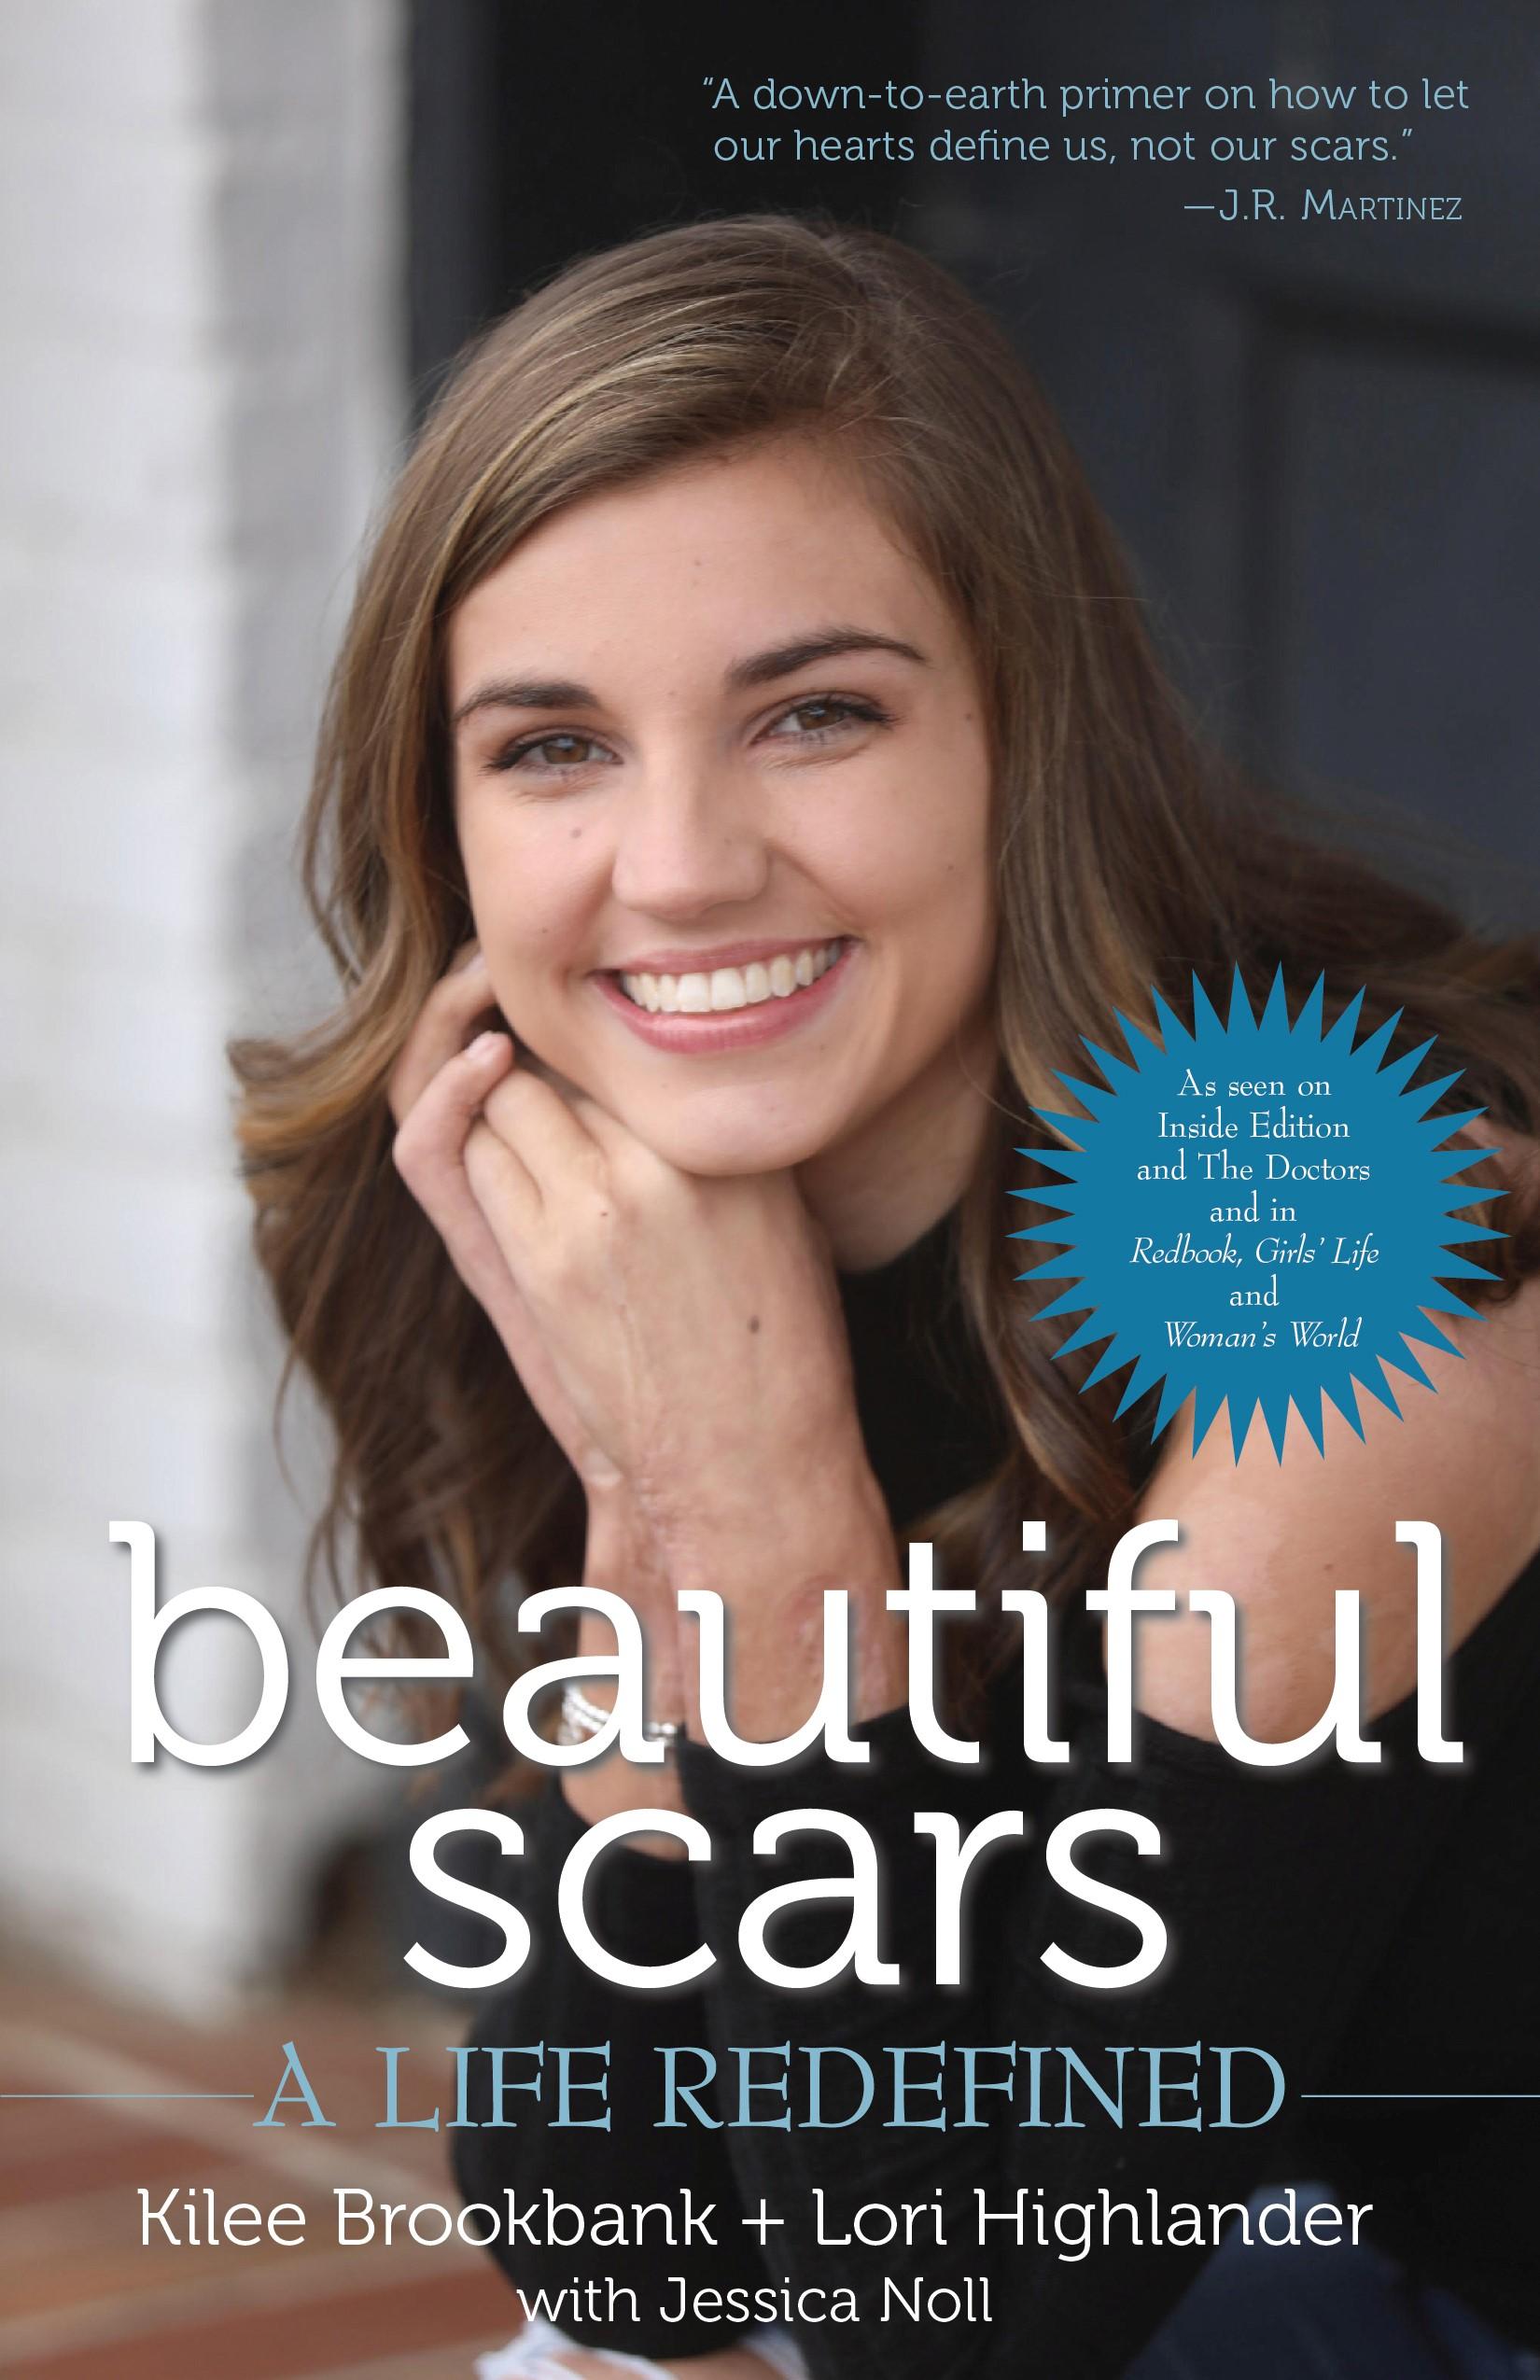 Kilee Brookbank Burn Survivor Beautiful Scars